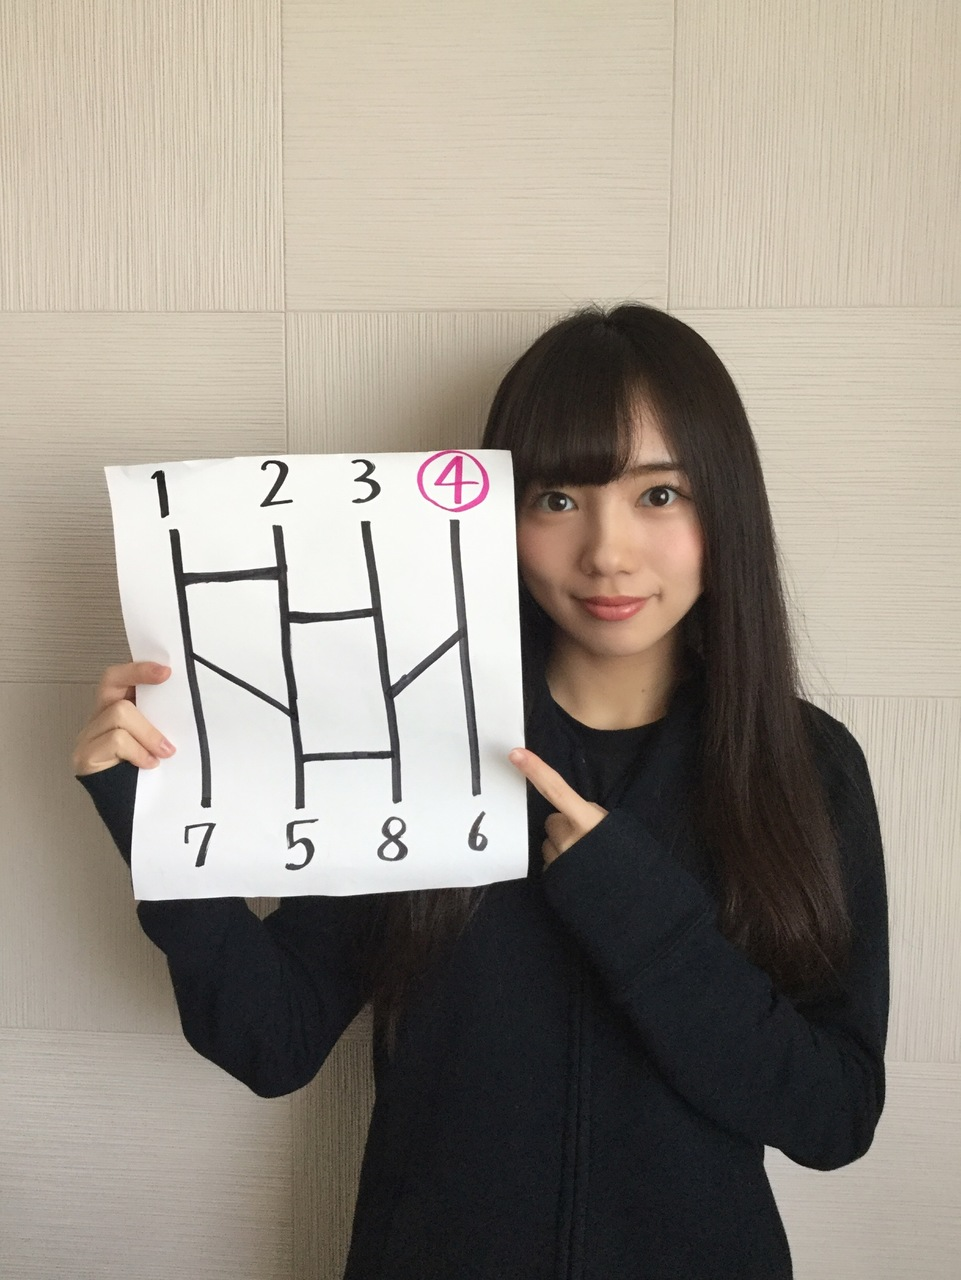 image5.JPG